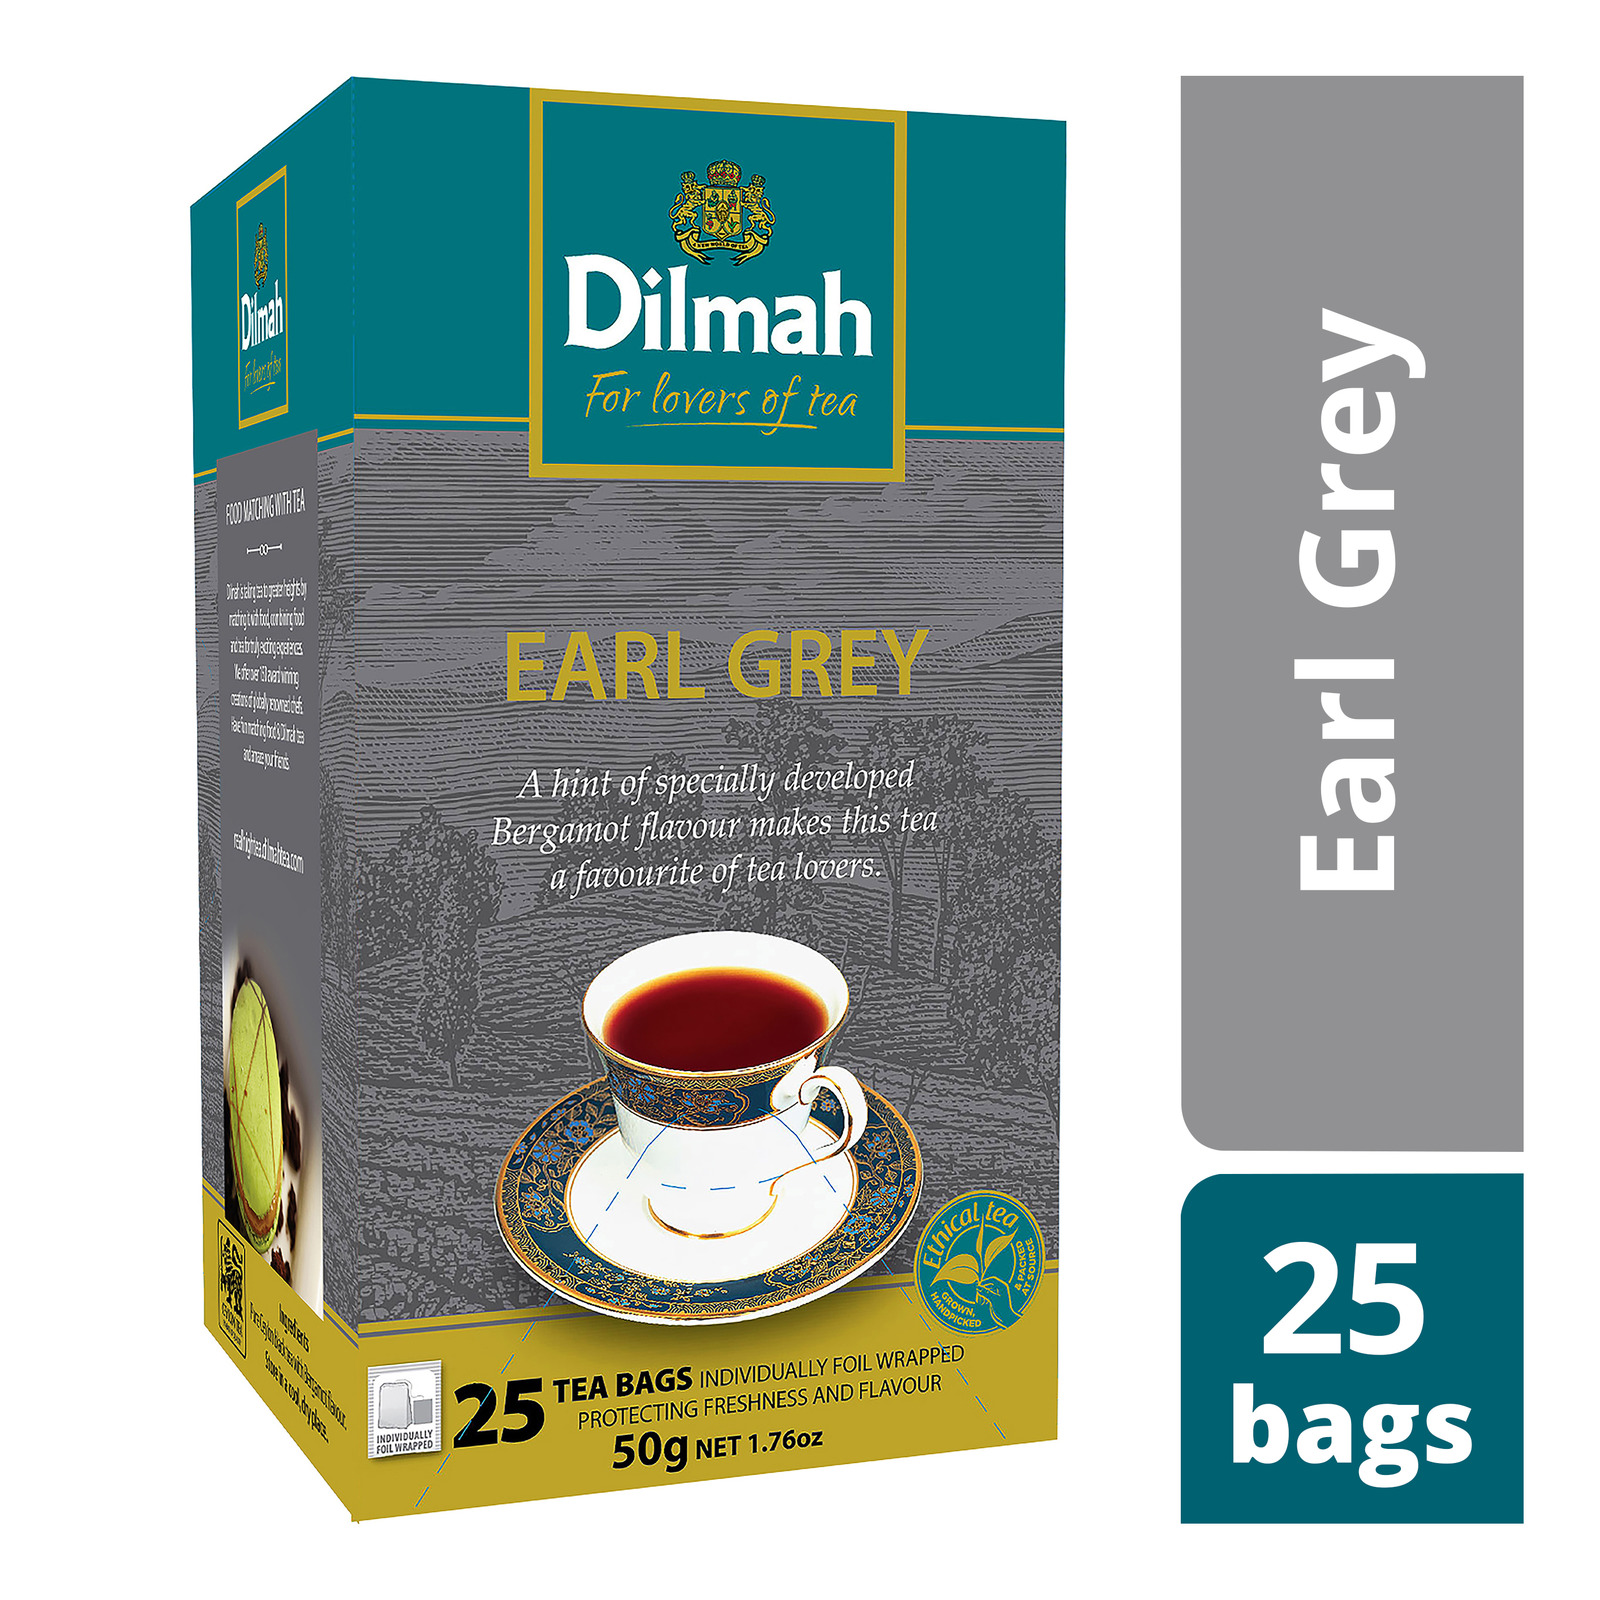 Dilmah Pure Ceylon Tea Bags - Earl Grey